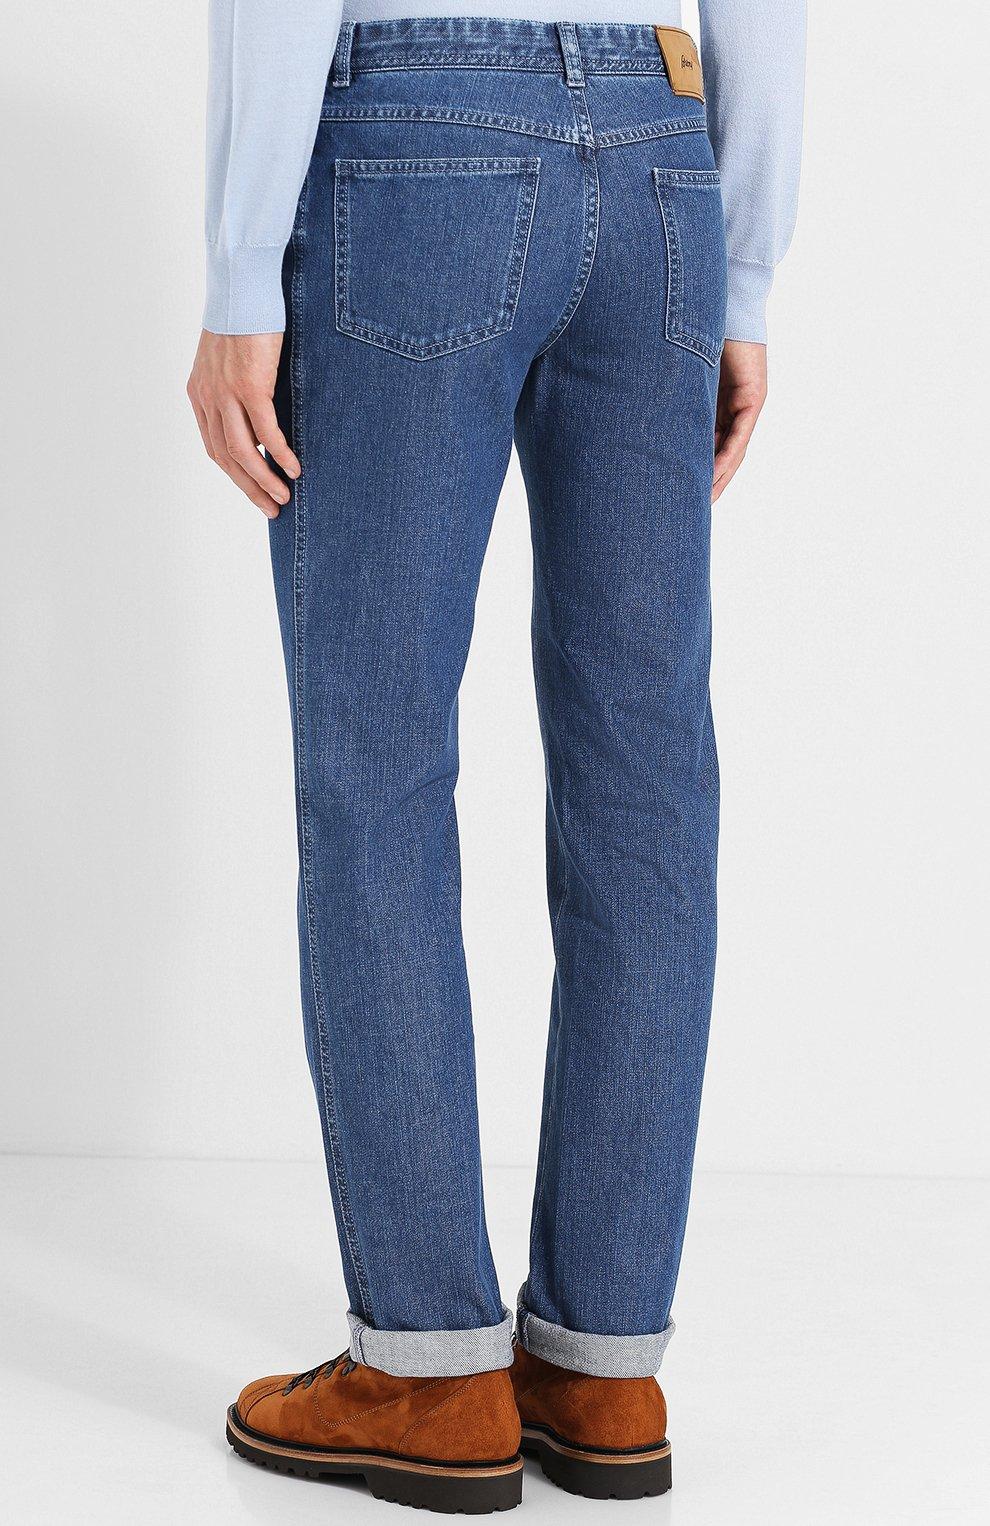 Мужские джинсы прямого кроя BRIONI синего цвета, арт. SPLE0L/07D13/CHAM0NIX | Фото 4